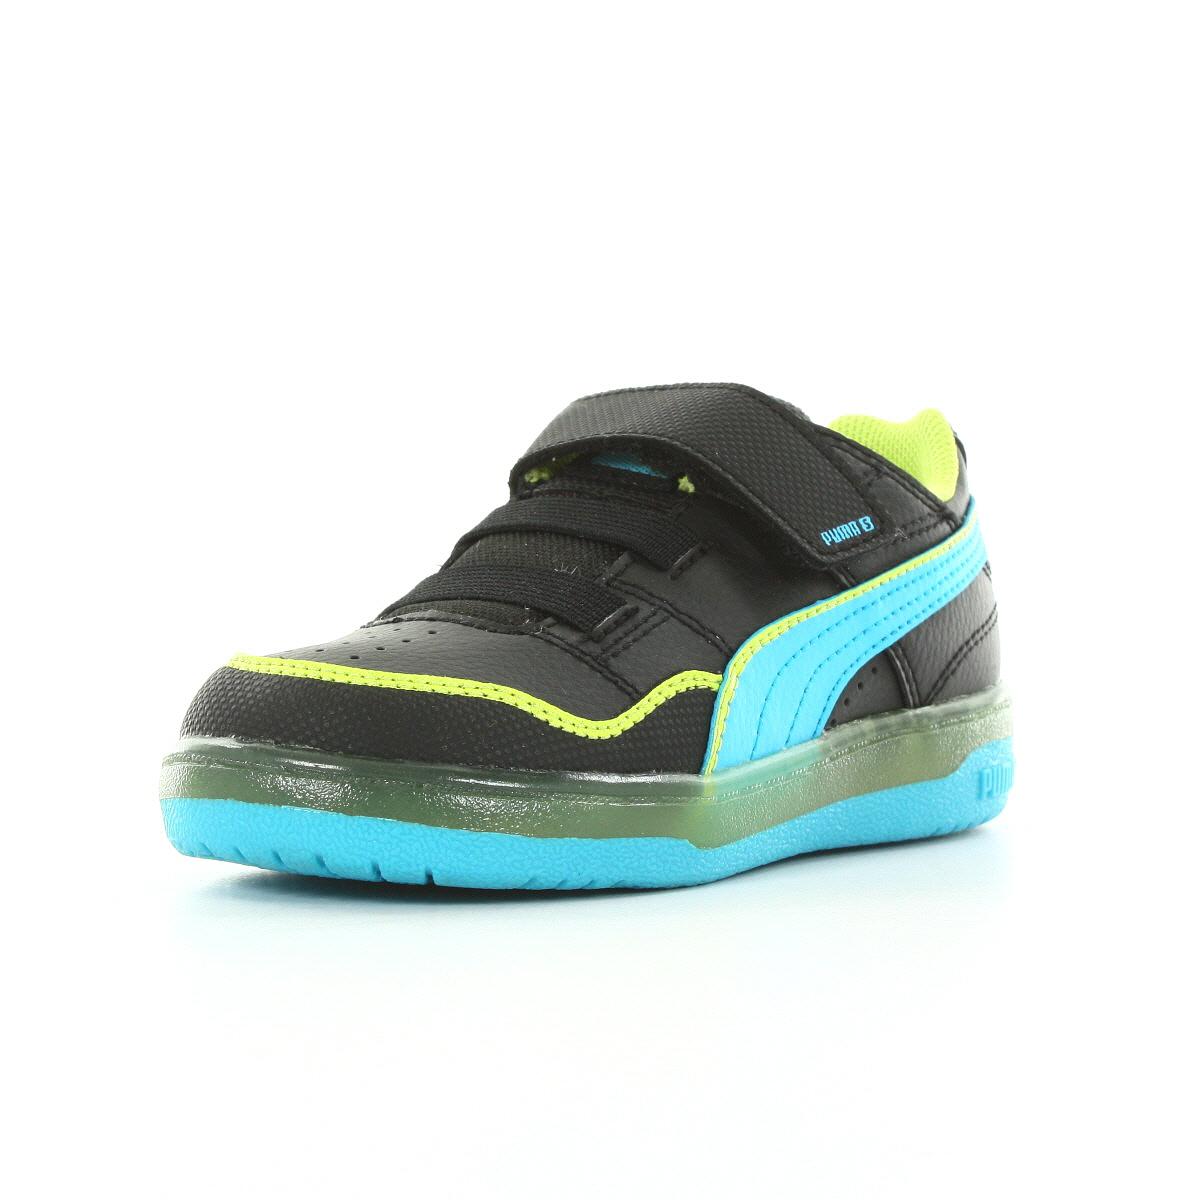 Chaussures Light Box